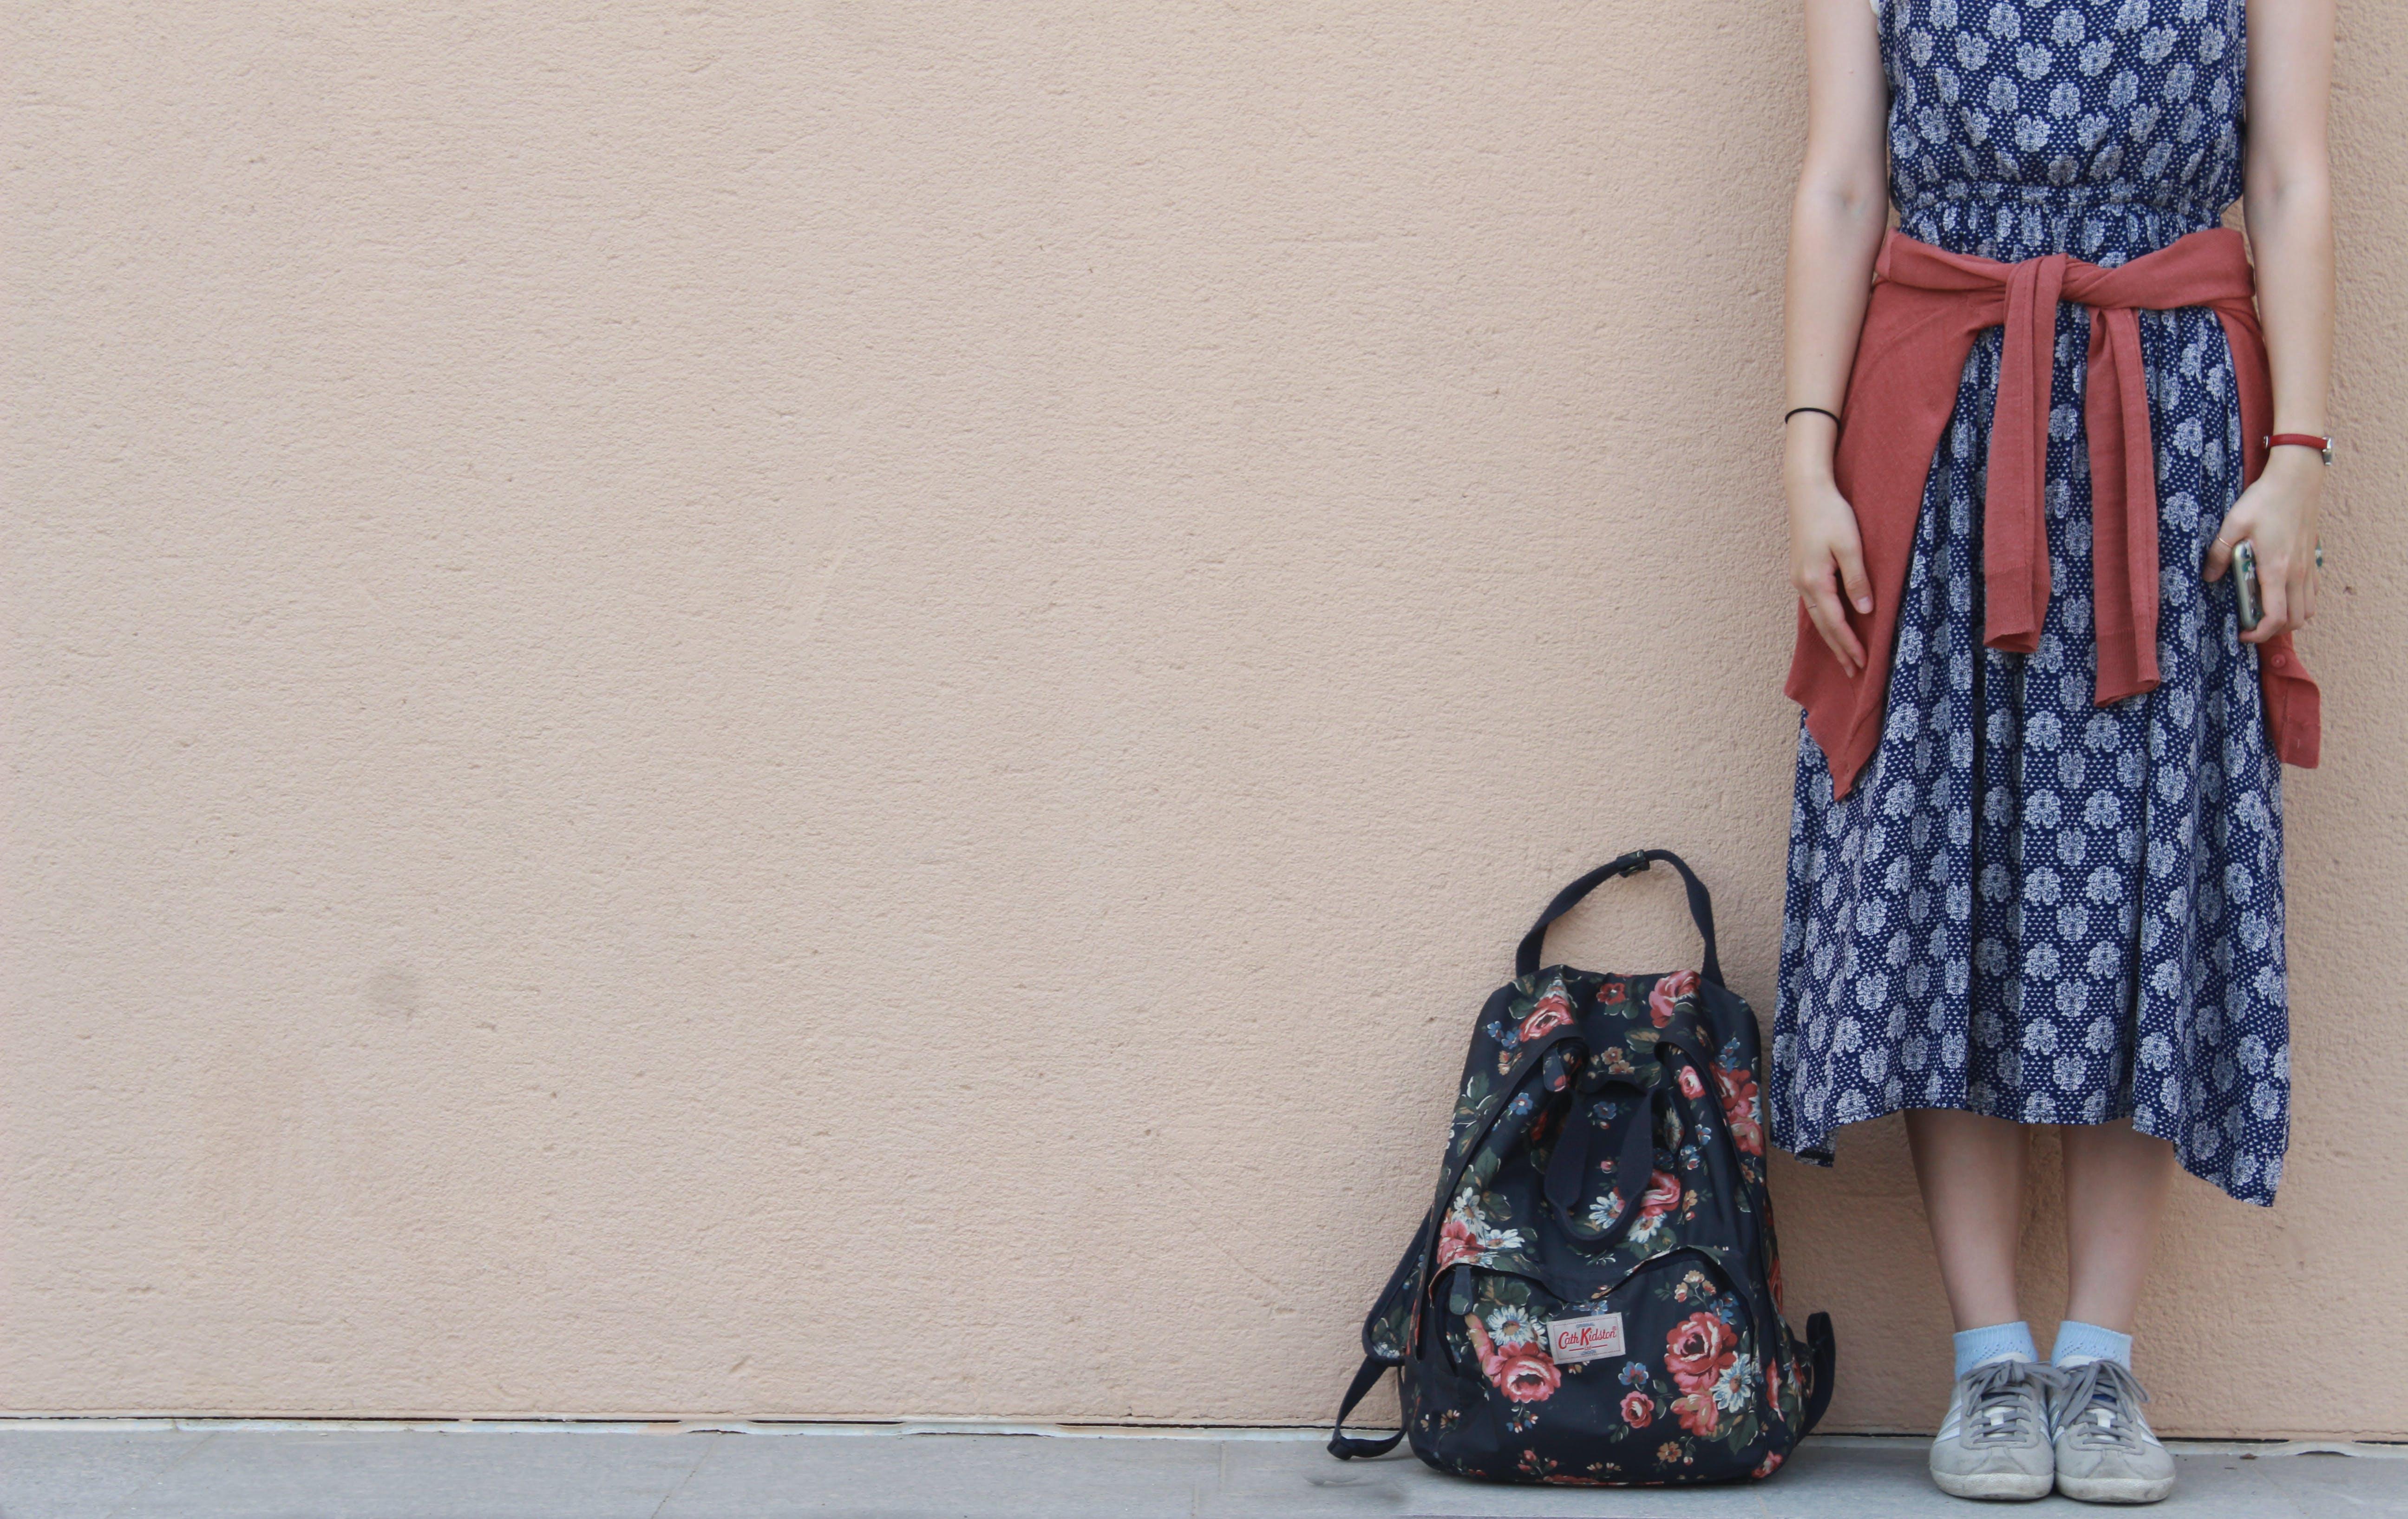 Gratis stockfoto met backpack, daglicht, fashion, fotomodel